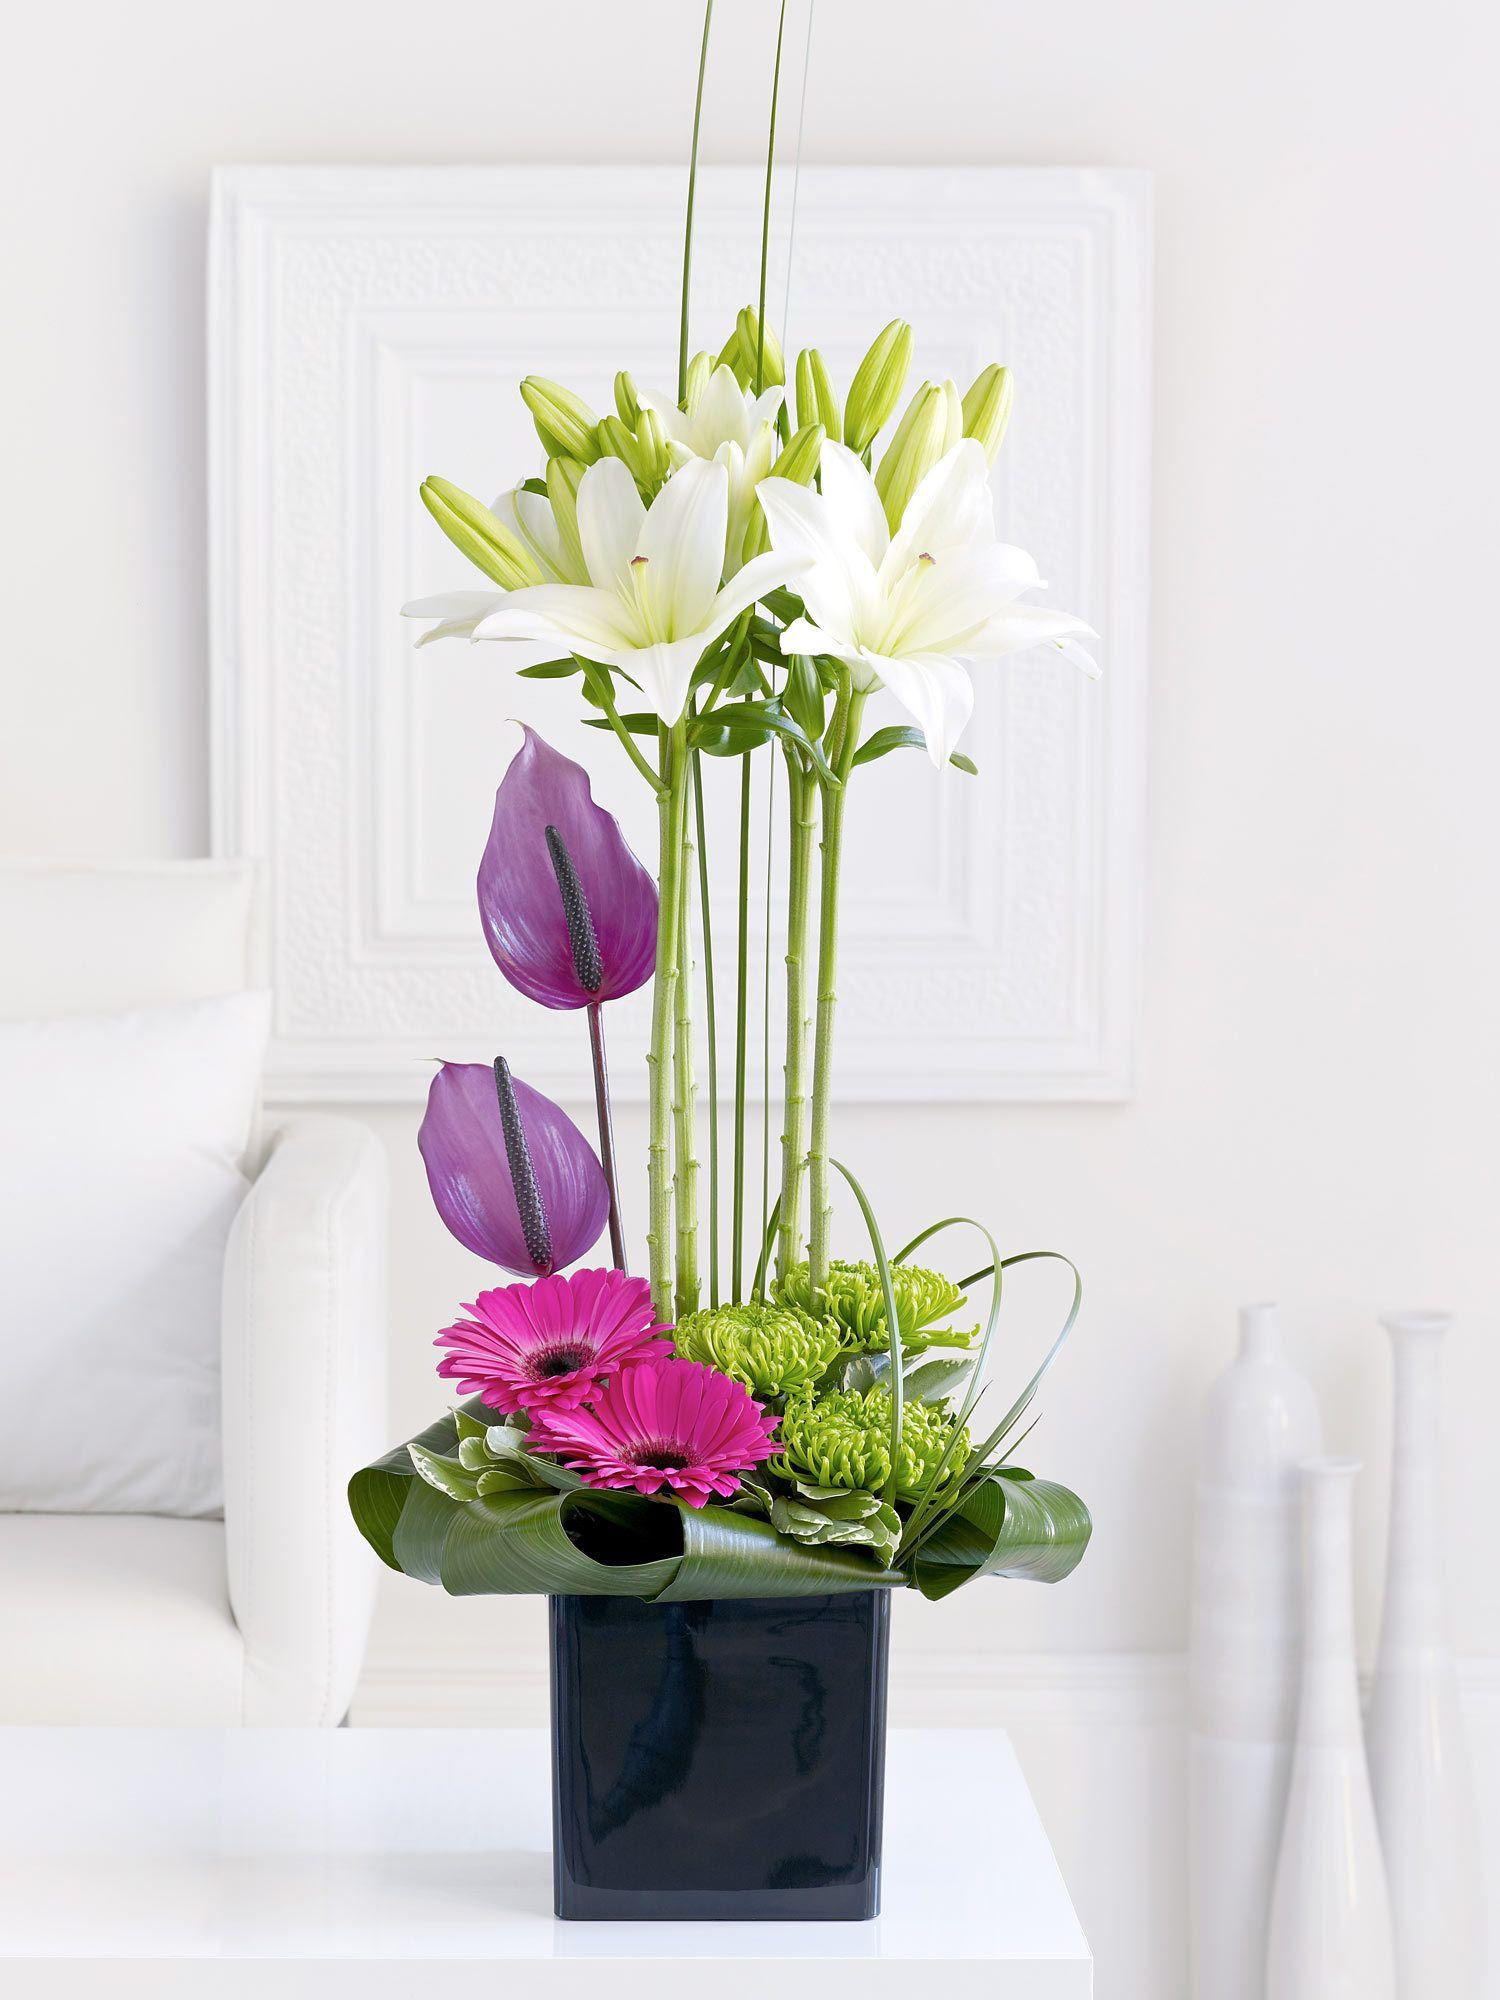 Lily And Anthurium Arrangement Interflora Floral Art